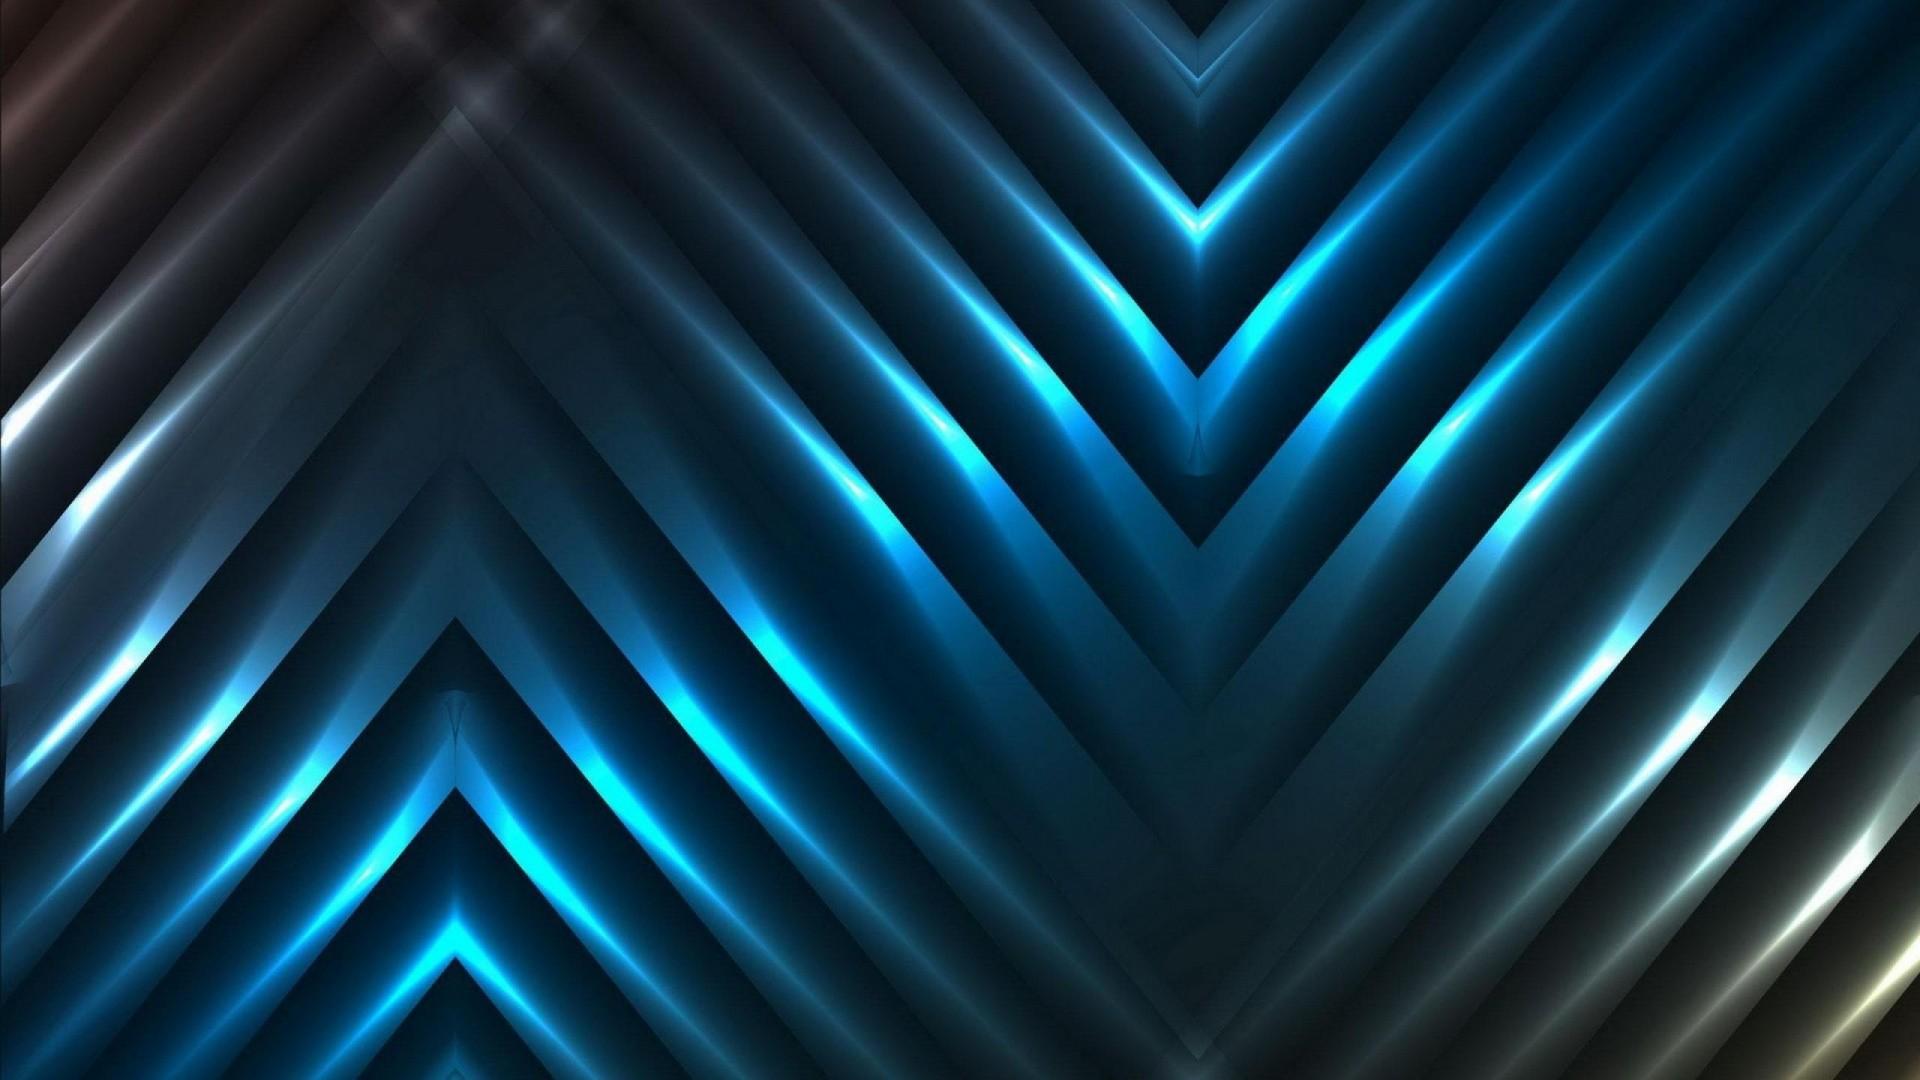 Amoled HD Wallpaper